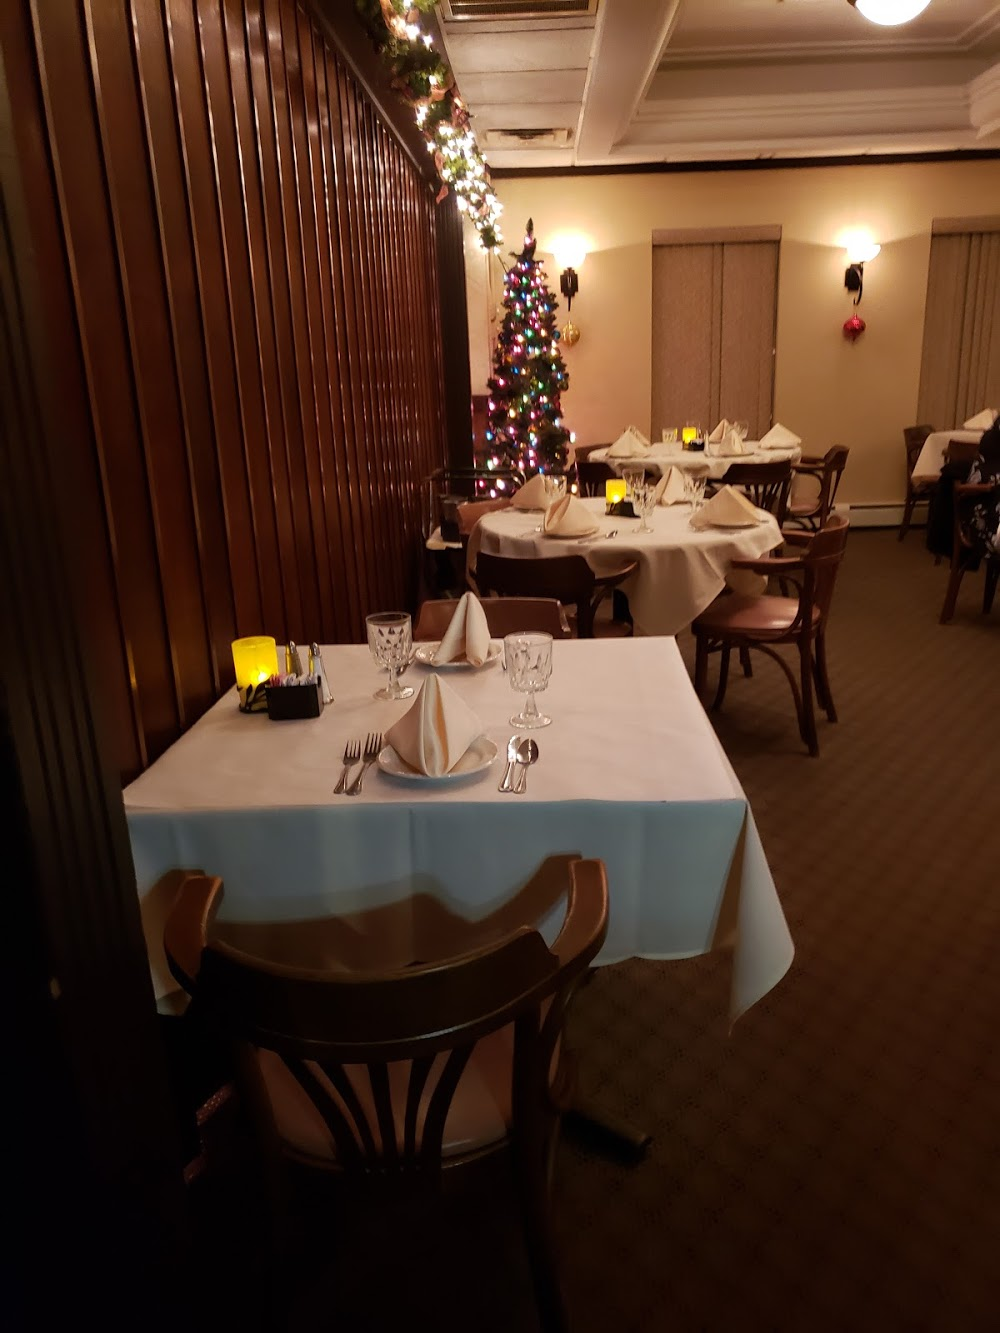 Lasca's Restaurant & Carry Out